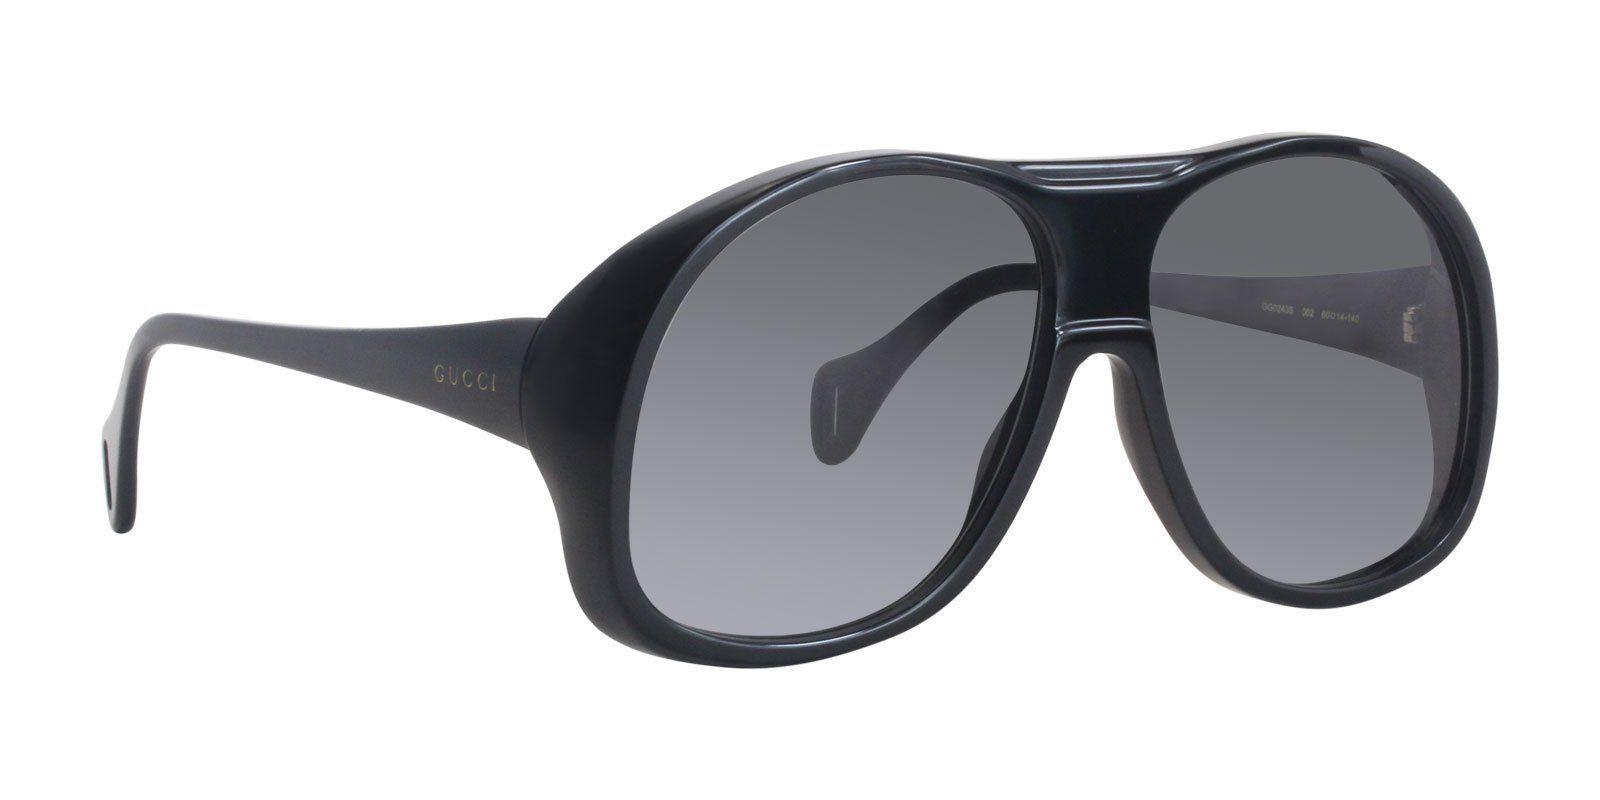 3788accf4c4 Gucci - GG0243S 002-sunglasses-Designer Eyes